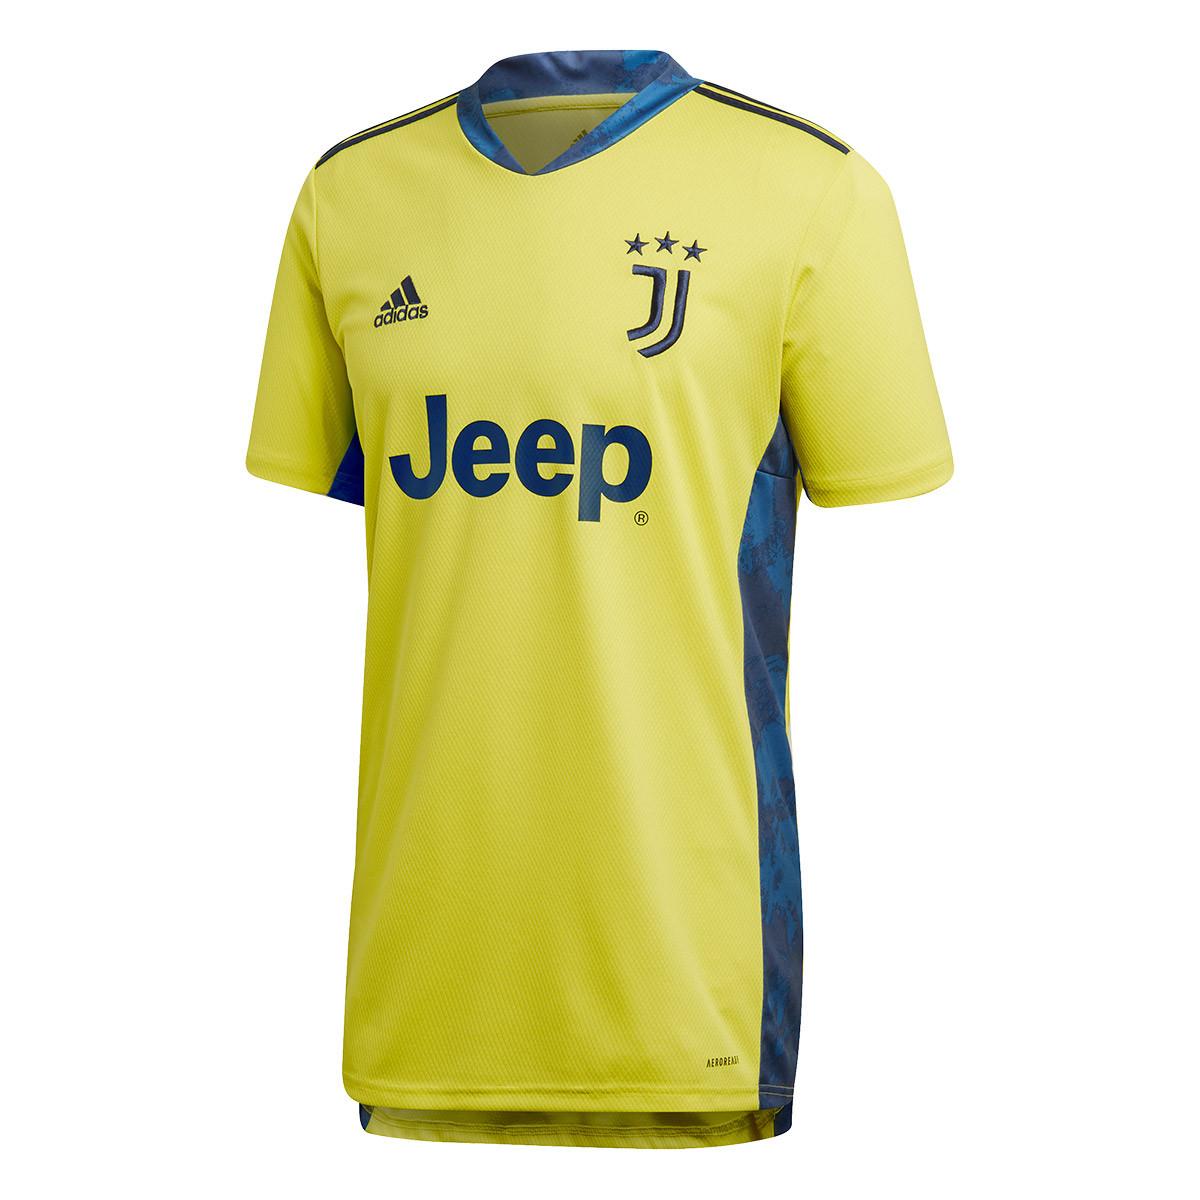 Jersey Adidas Juventus Portero Primera Equipacion 2020 2021 Shock Yellow Team Navy Blue Football Store Futbol Emotion